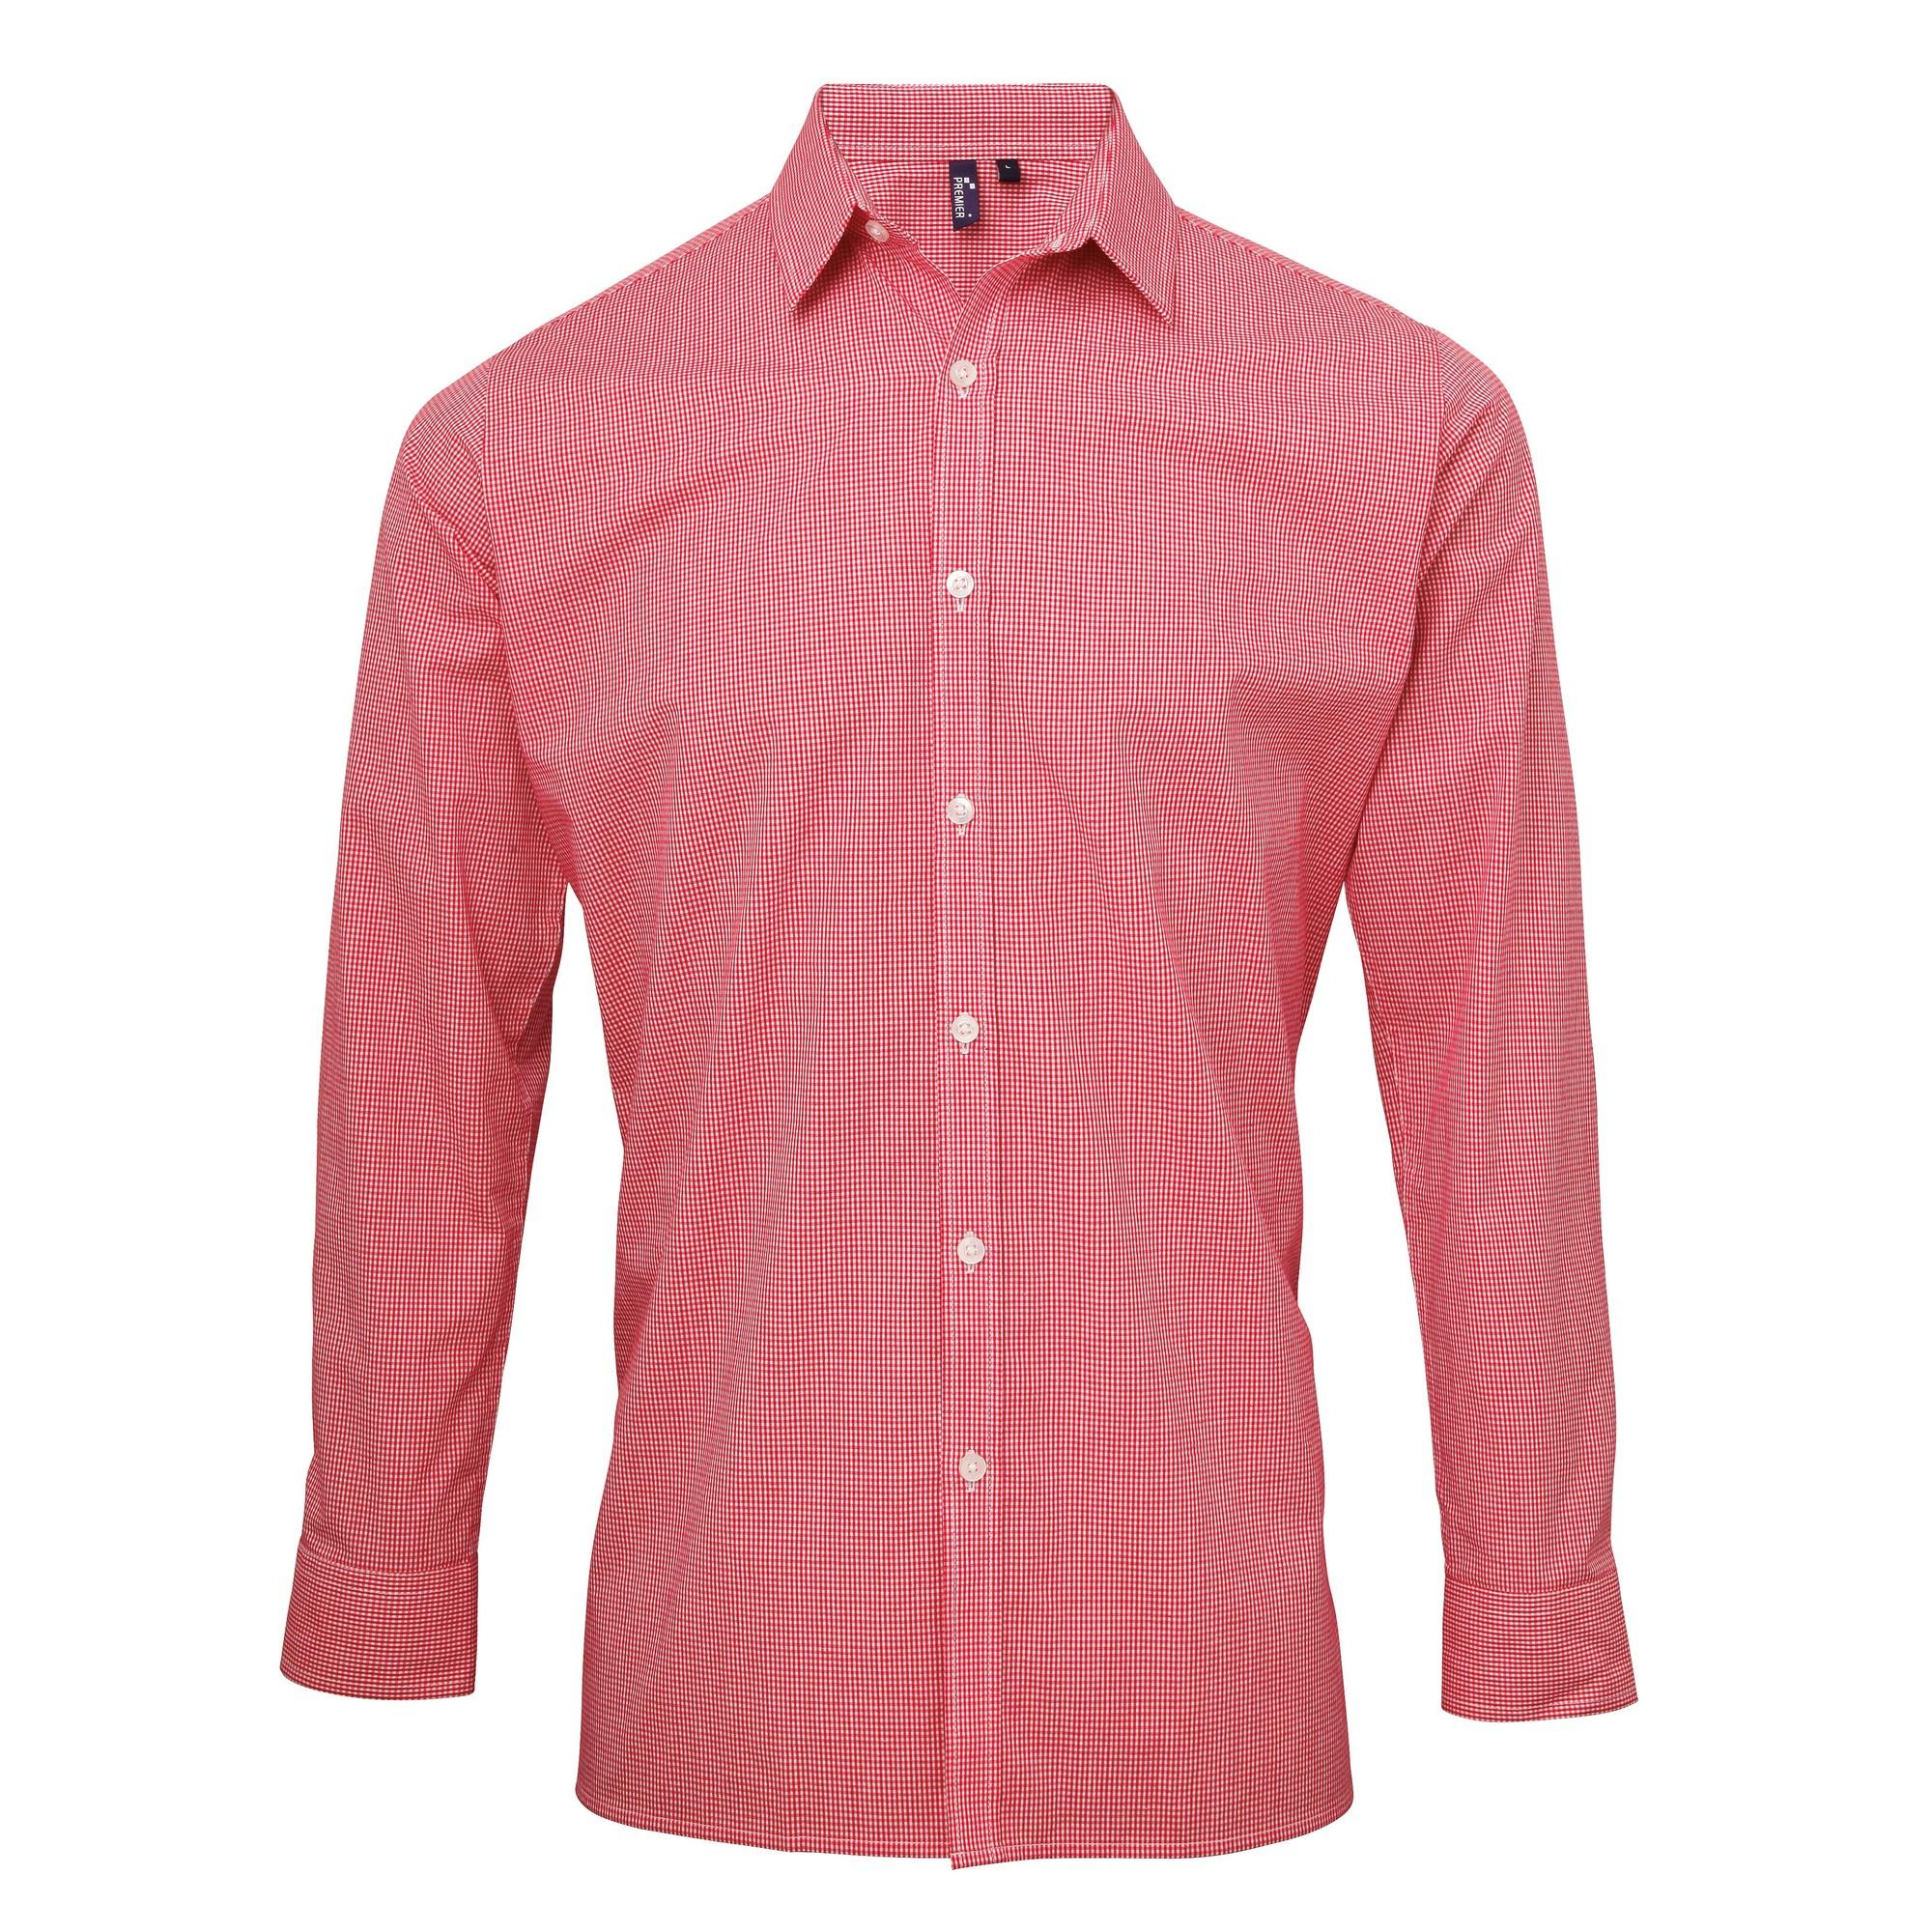 Premier Mens Microcheck Long Sleeve Shirt (M) (Red/White)